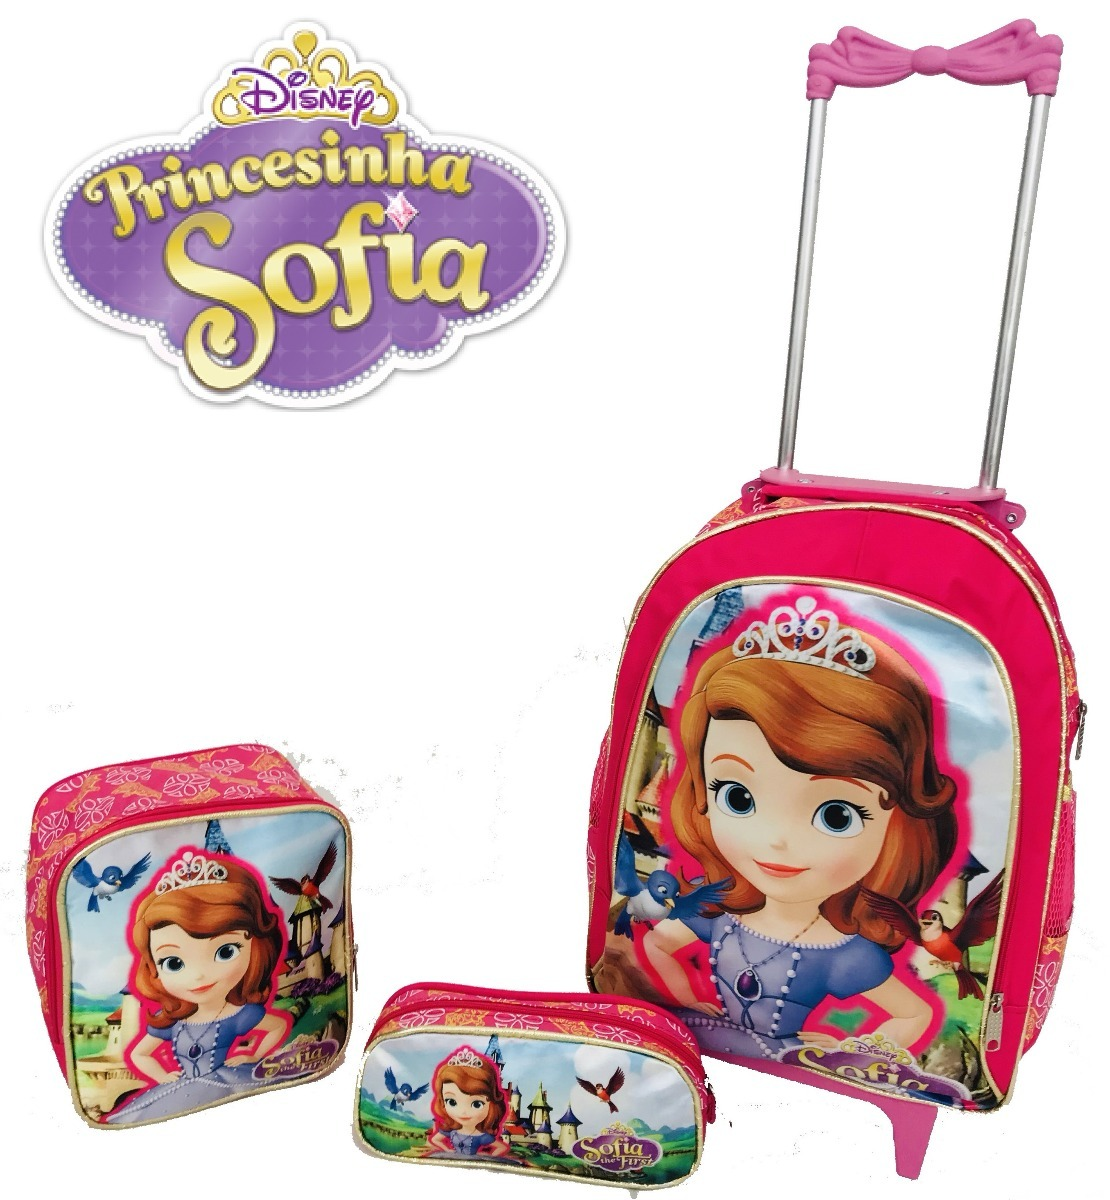 9a37038d7d kit mochila princesa sofia + lancheira + estojo grande 2018. Carregando zoom .